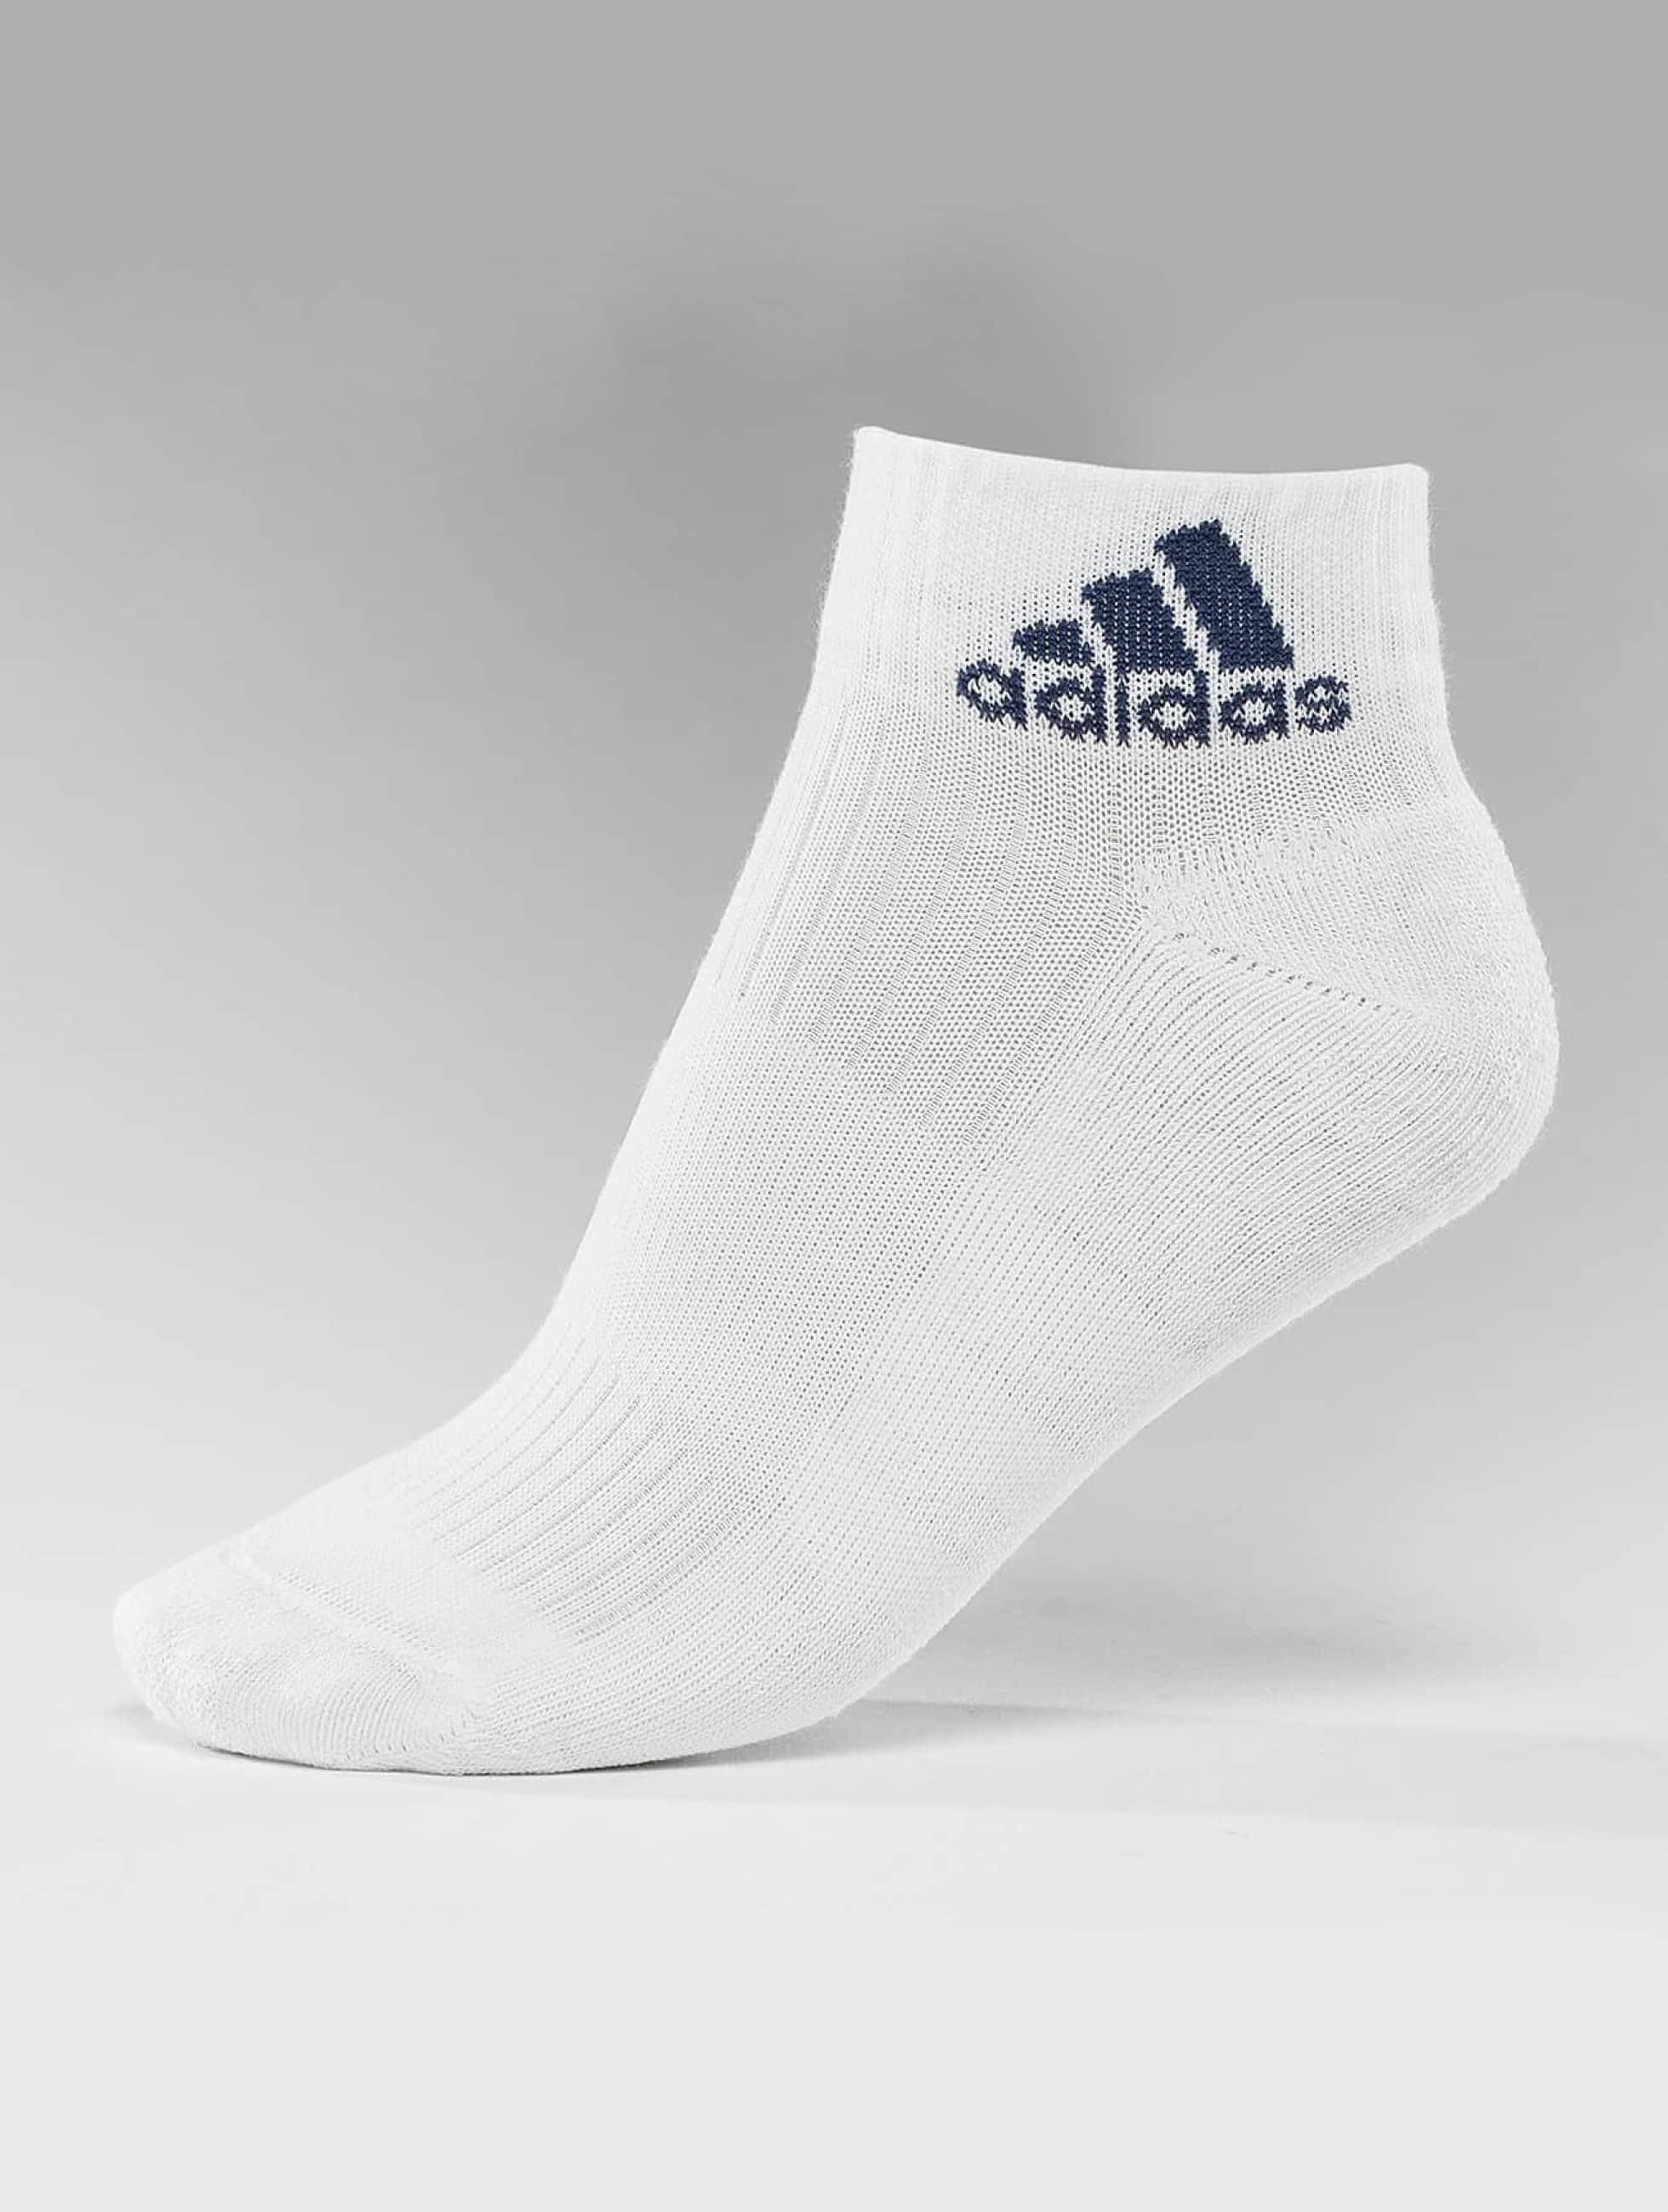 adidas originals Skarpetki 3-Stripes Per An HC 3-Pairs niebieski